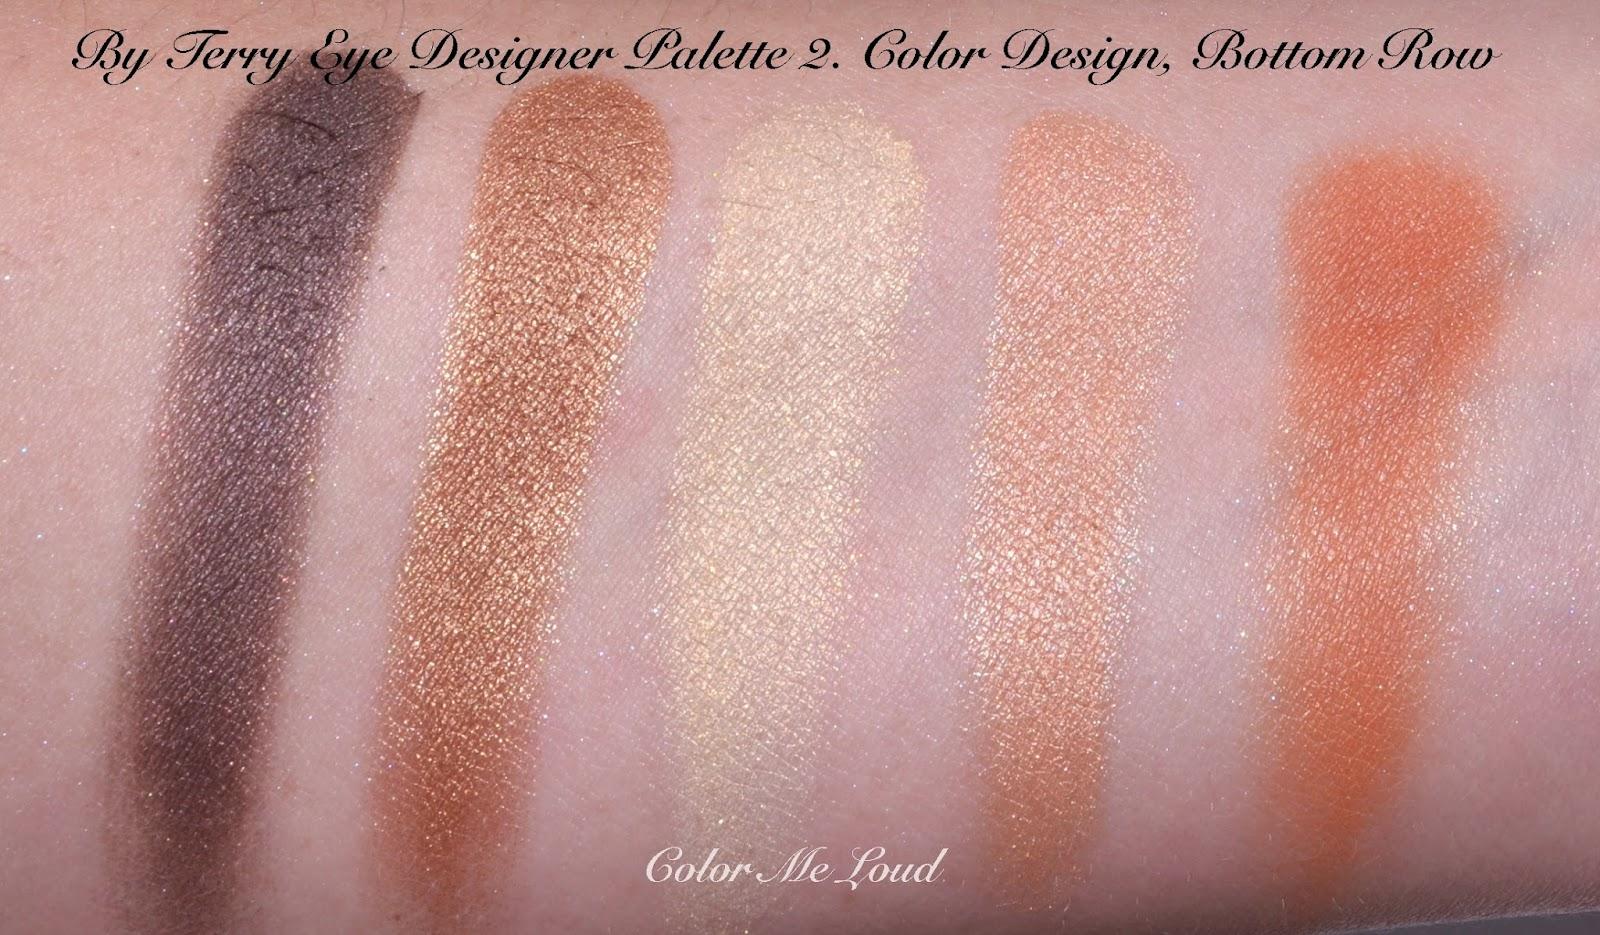 Color Design Eye Palette by Lancôme #3